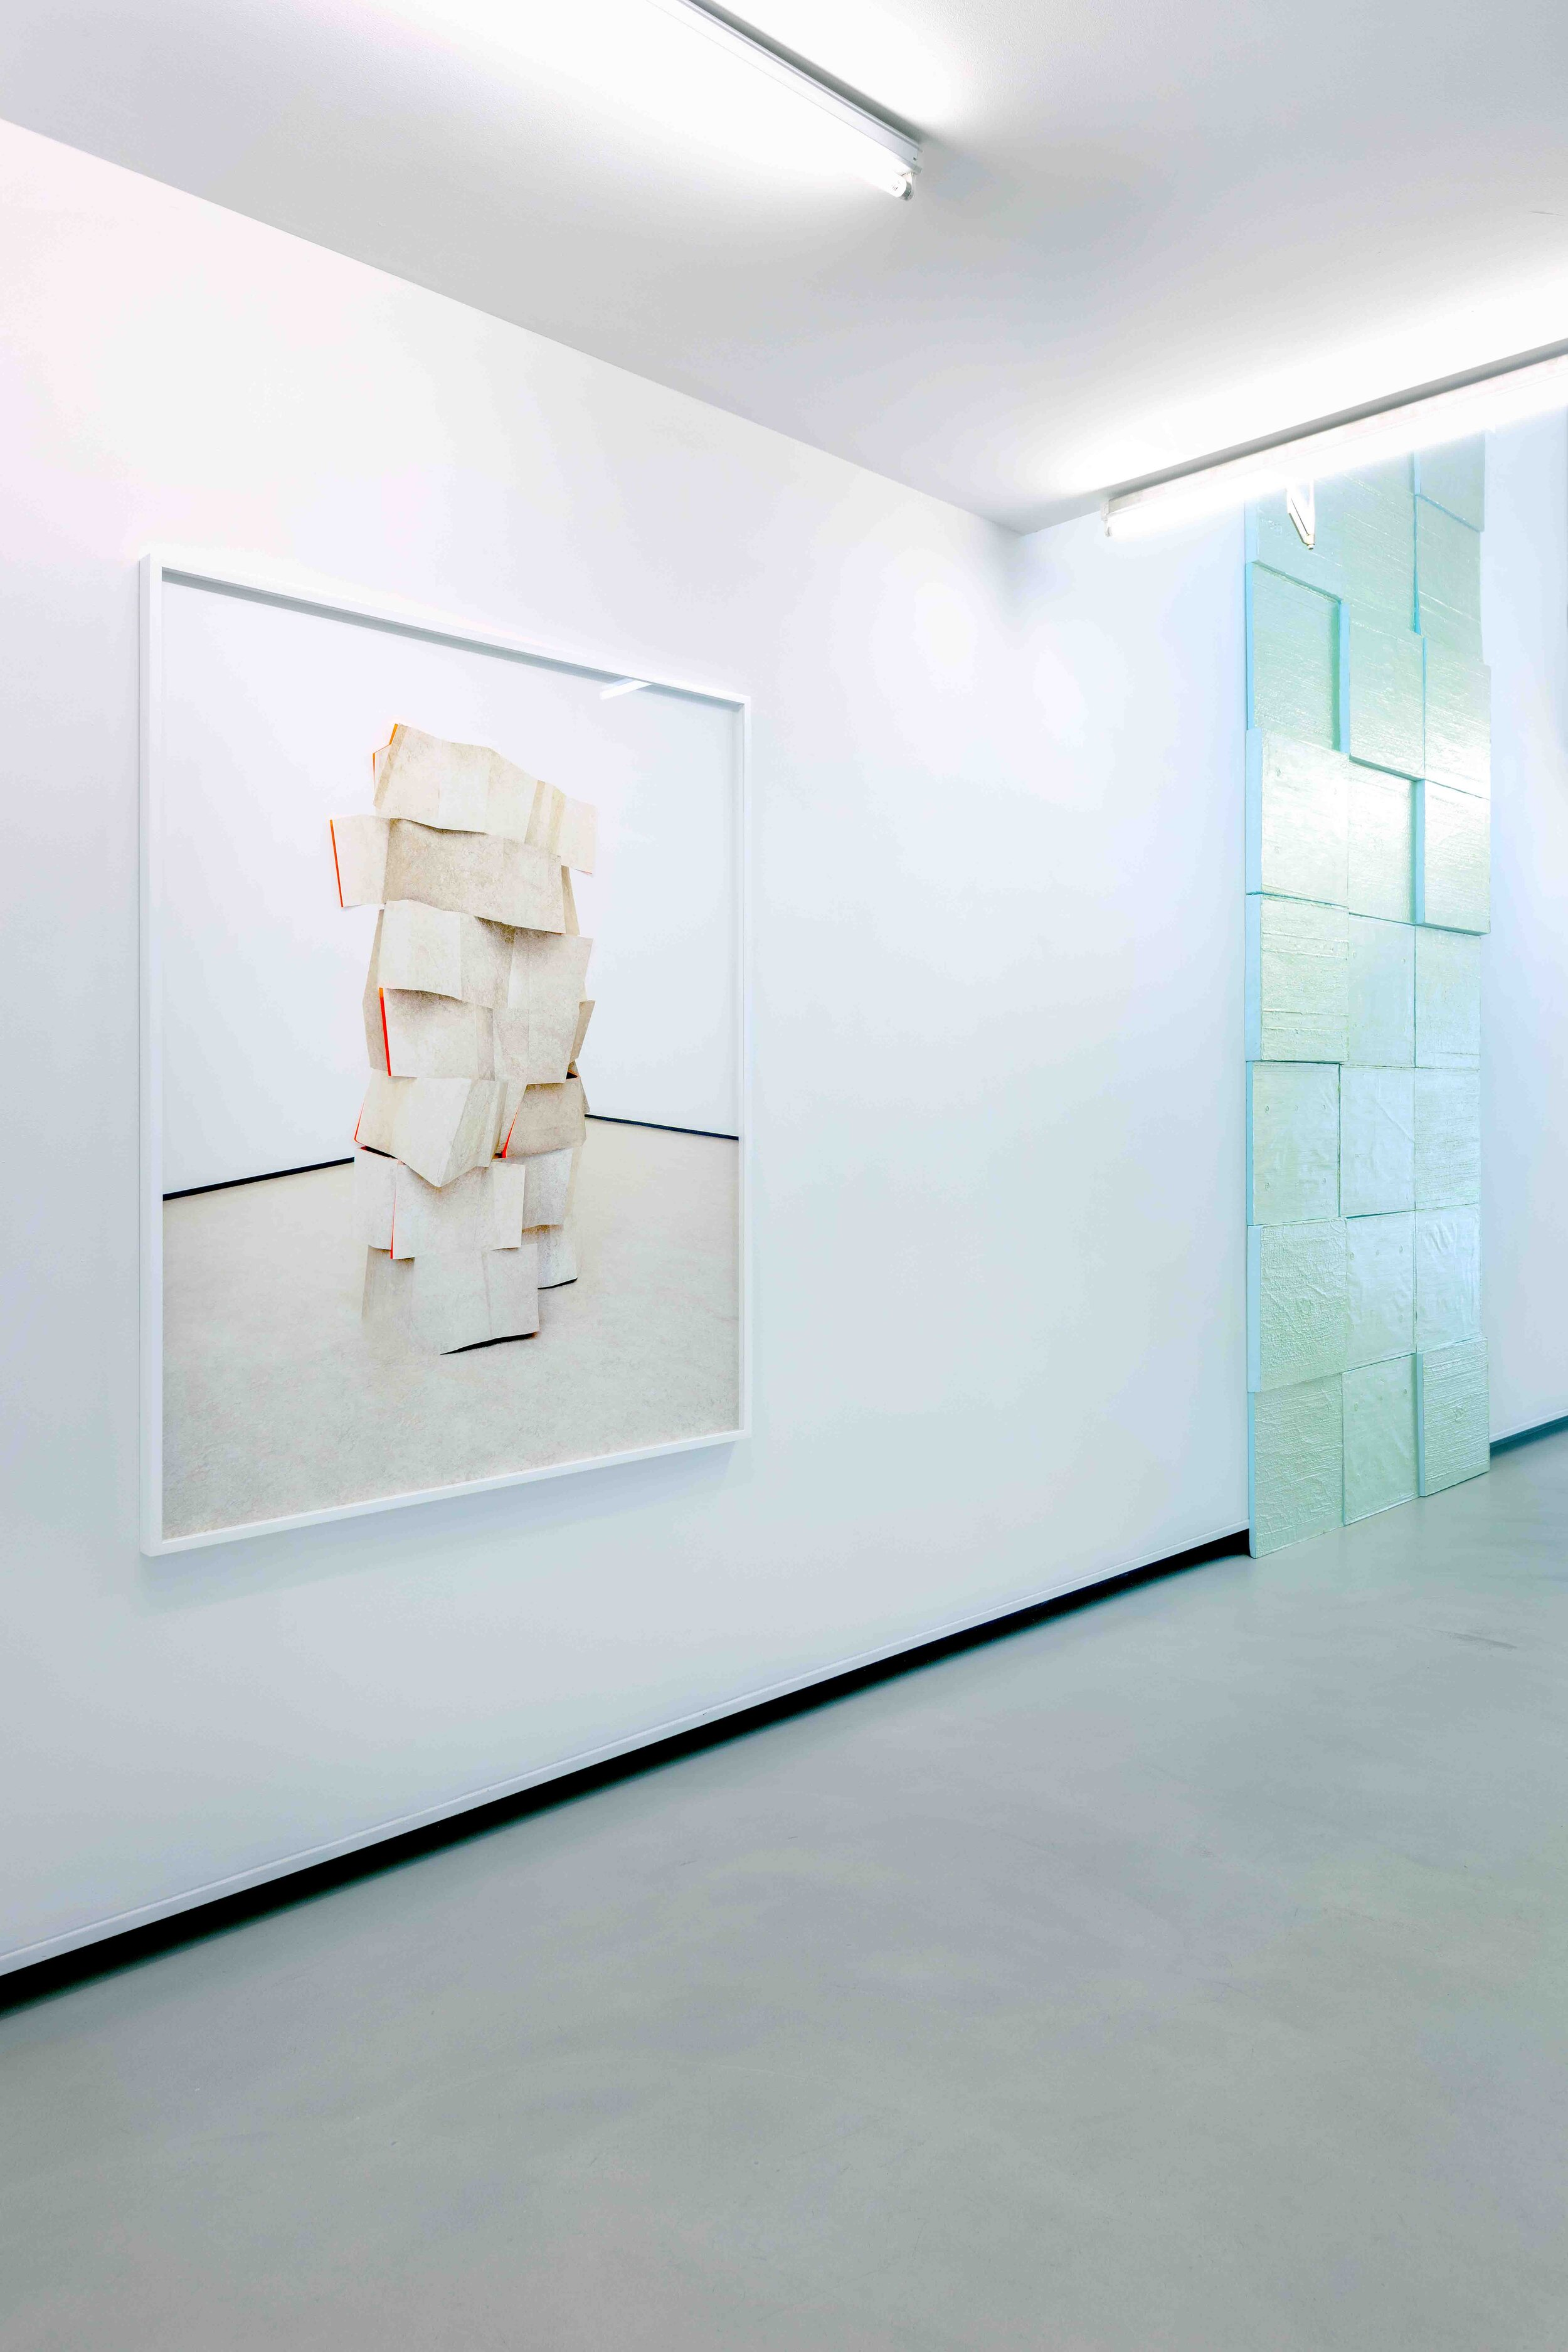 Sleeuwits-LayingBare-GalleryBart-4-usm.jpg